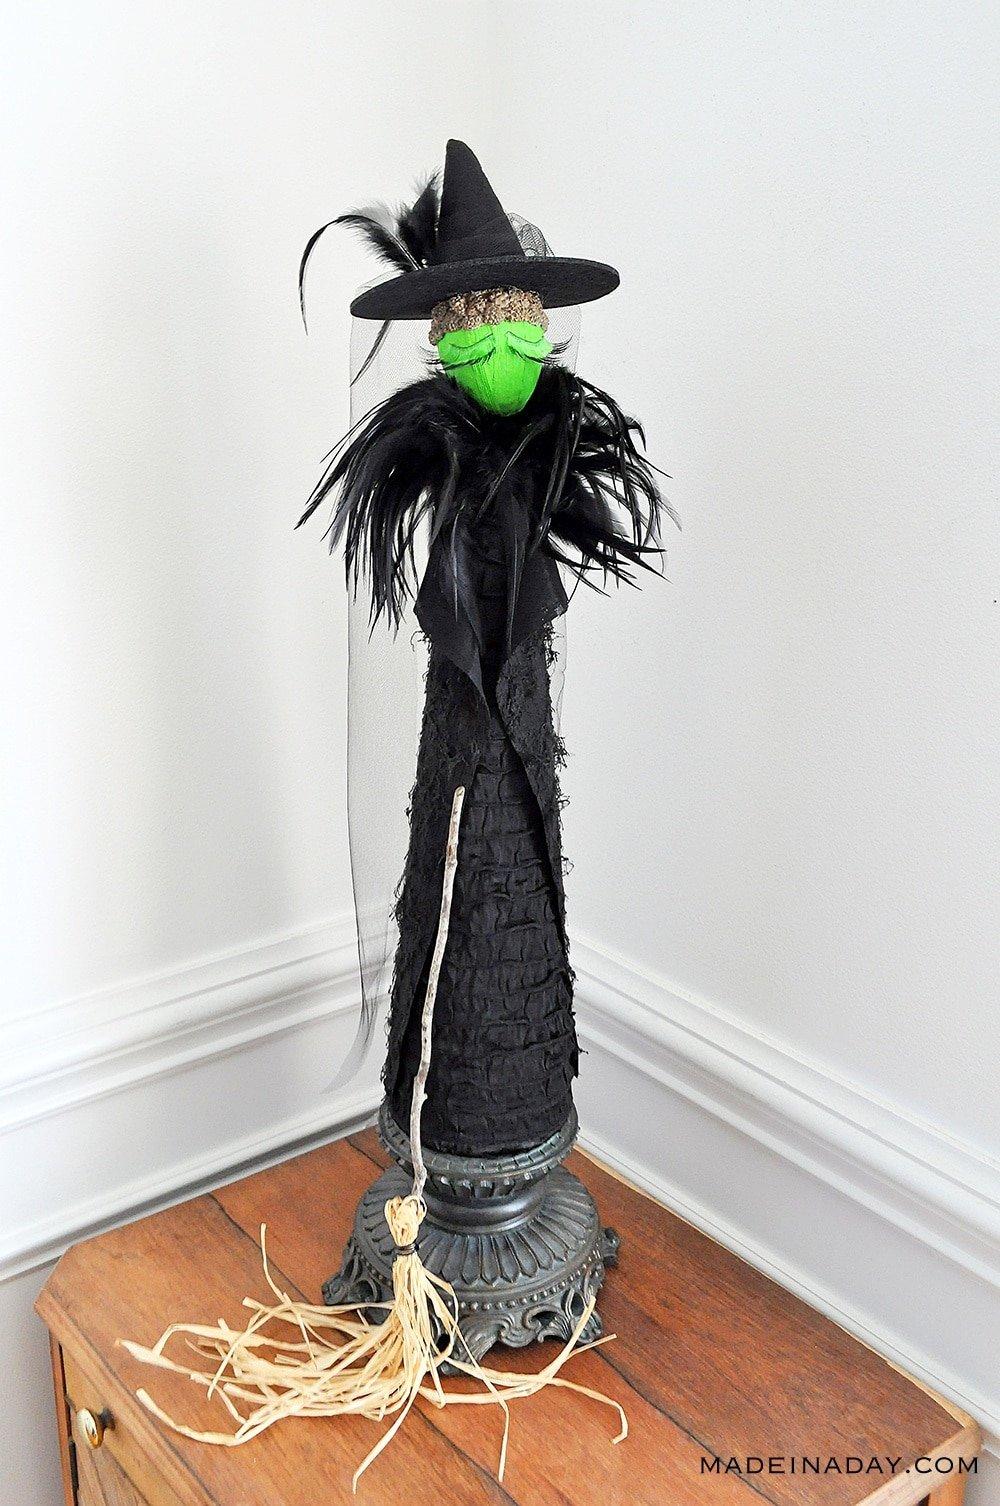 DIY Wicked Witch Figure, Broadway Wicked Figurine, Craft Witch